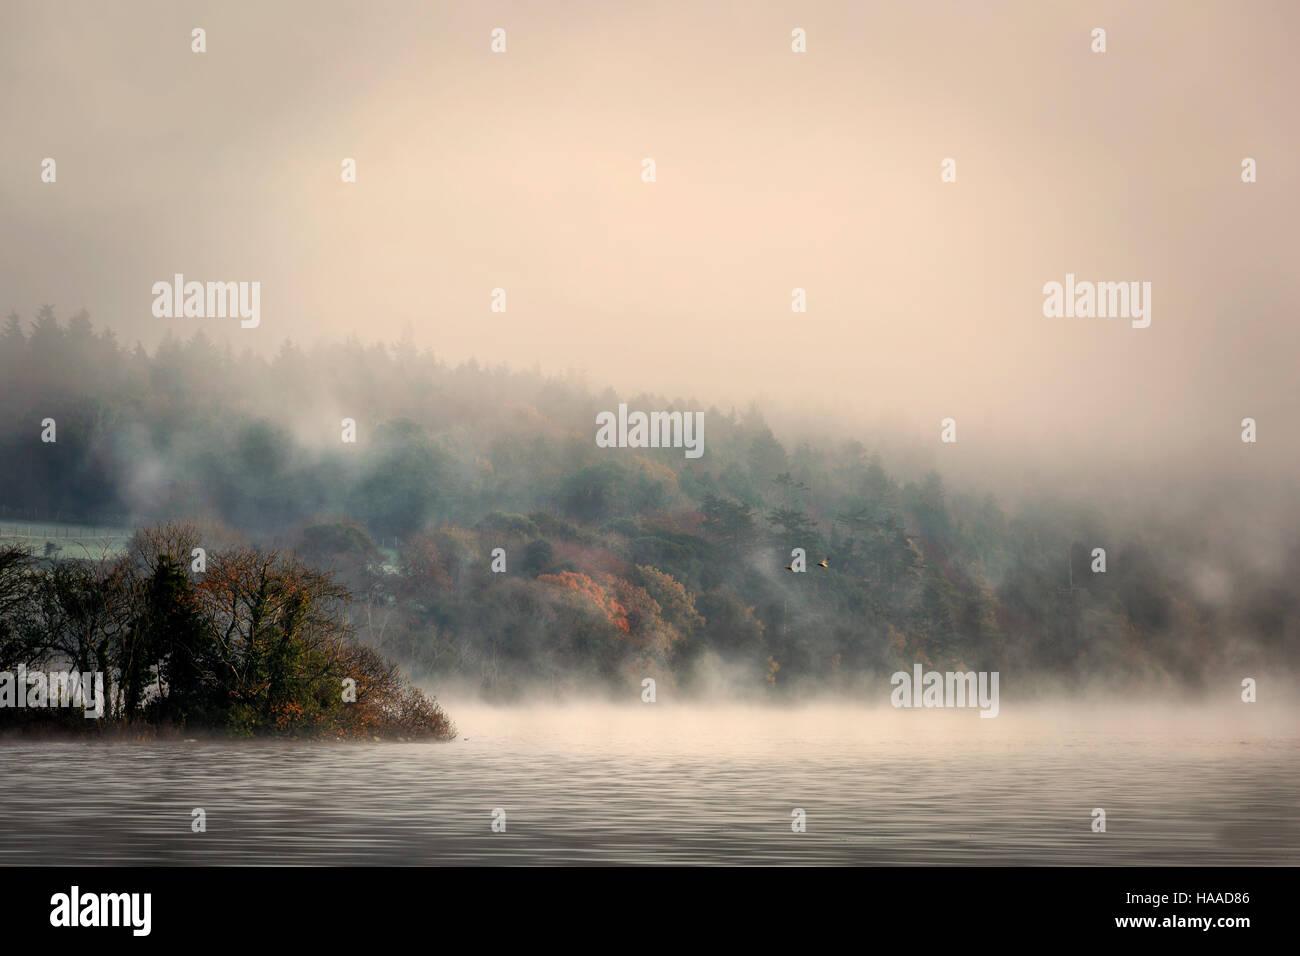 morning mist rising over lough gill ireland - Stock Image